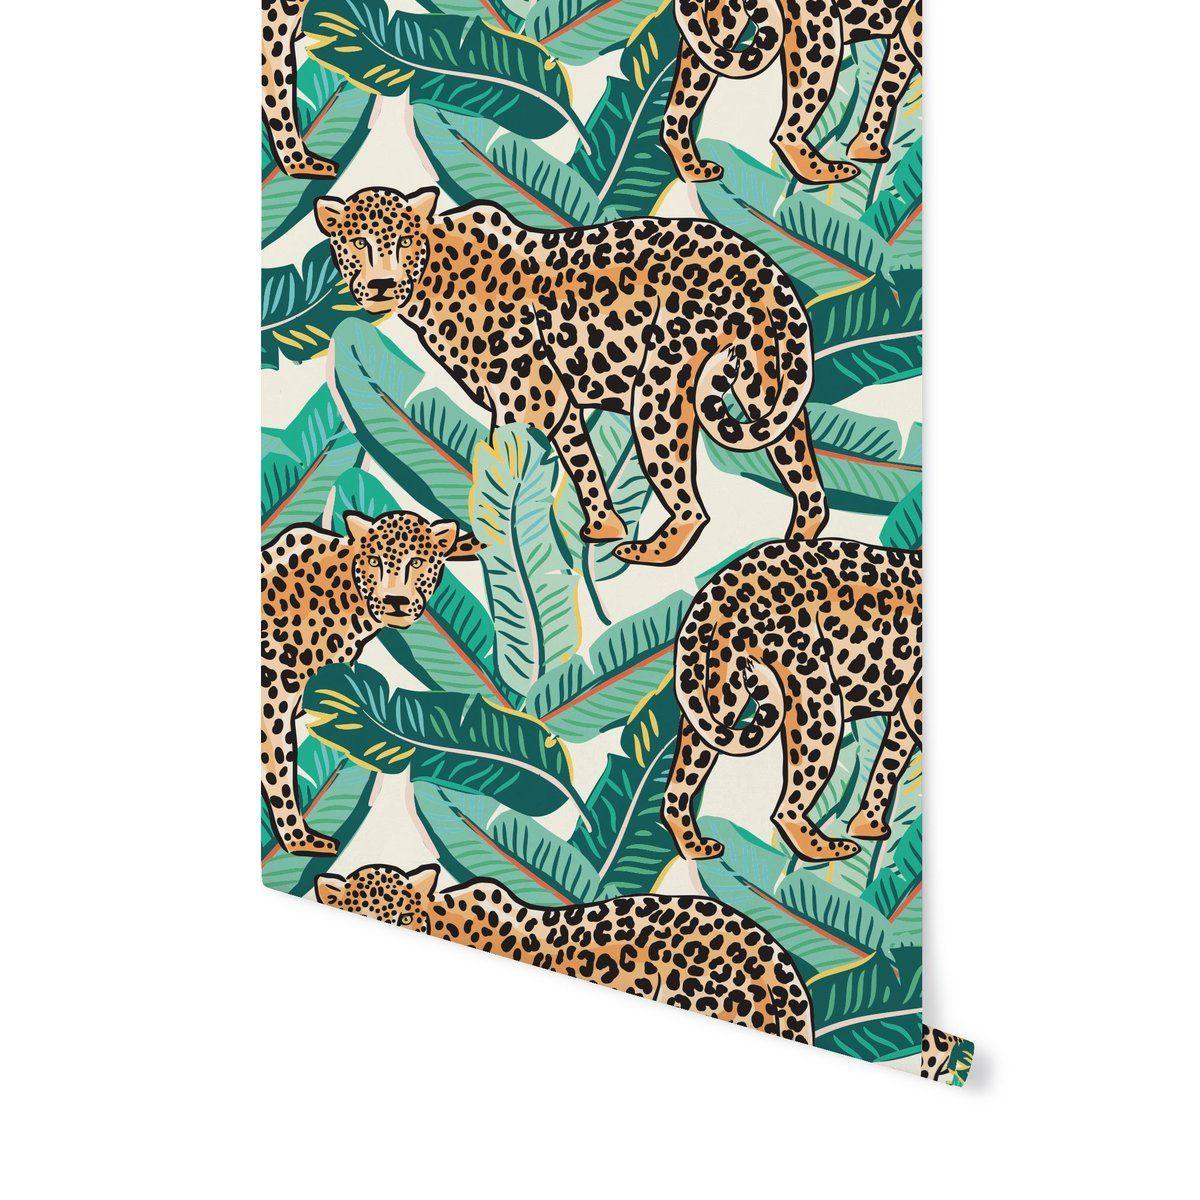 Jungle Leopard Banana Leaf Banana Leaf Banana Leaf Pattern Peel And Stick Wallpaper